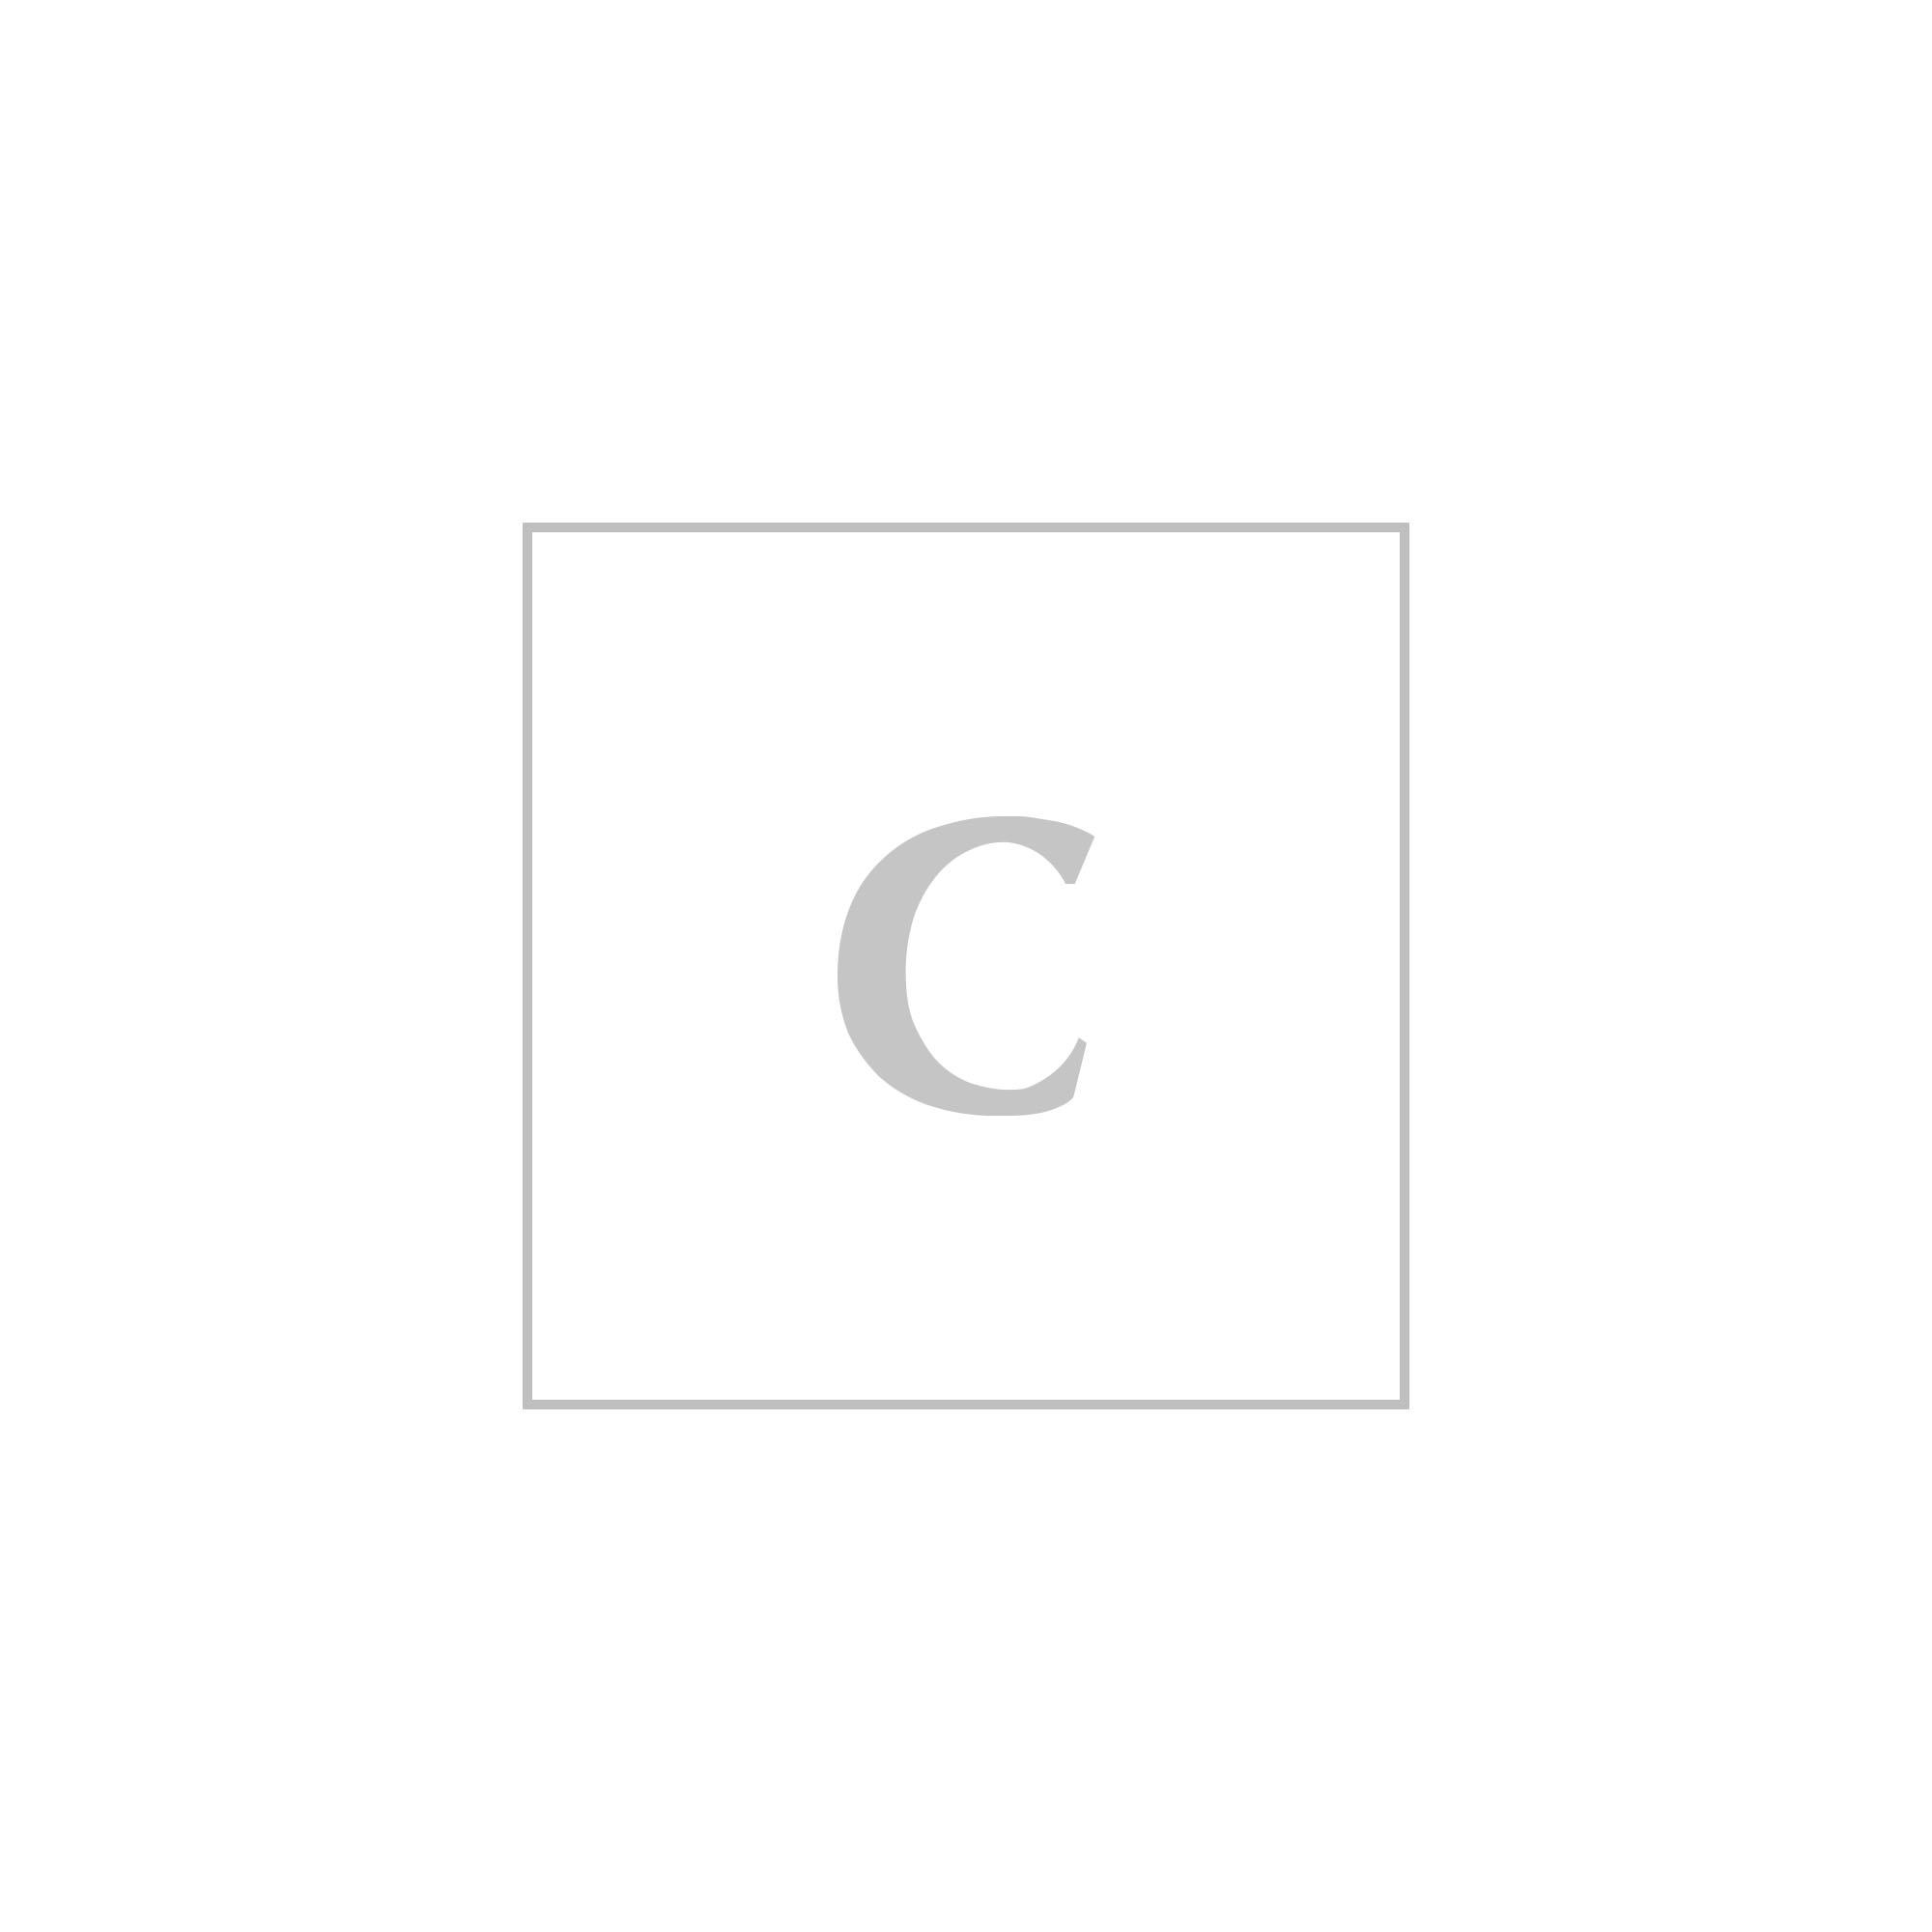 Cc collection corneliani chino trousers